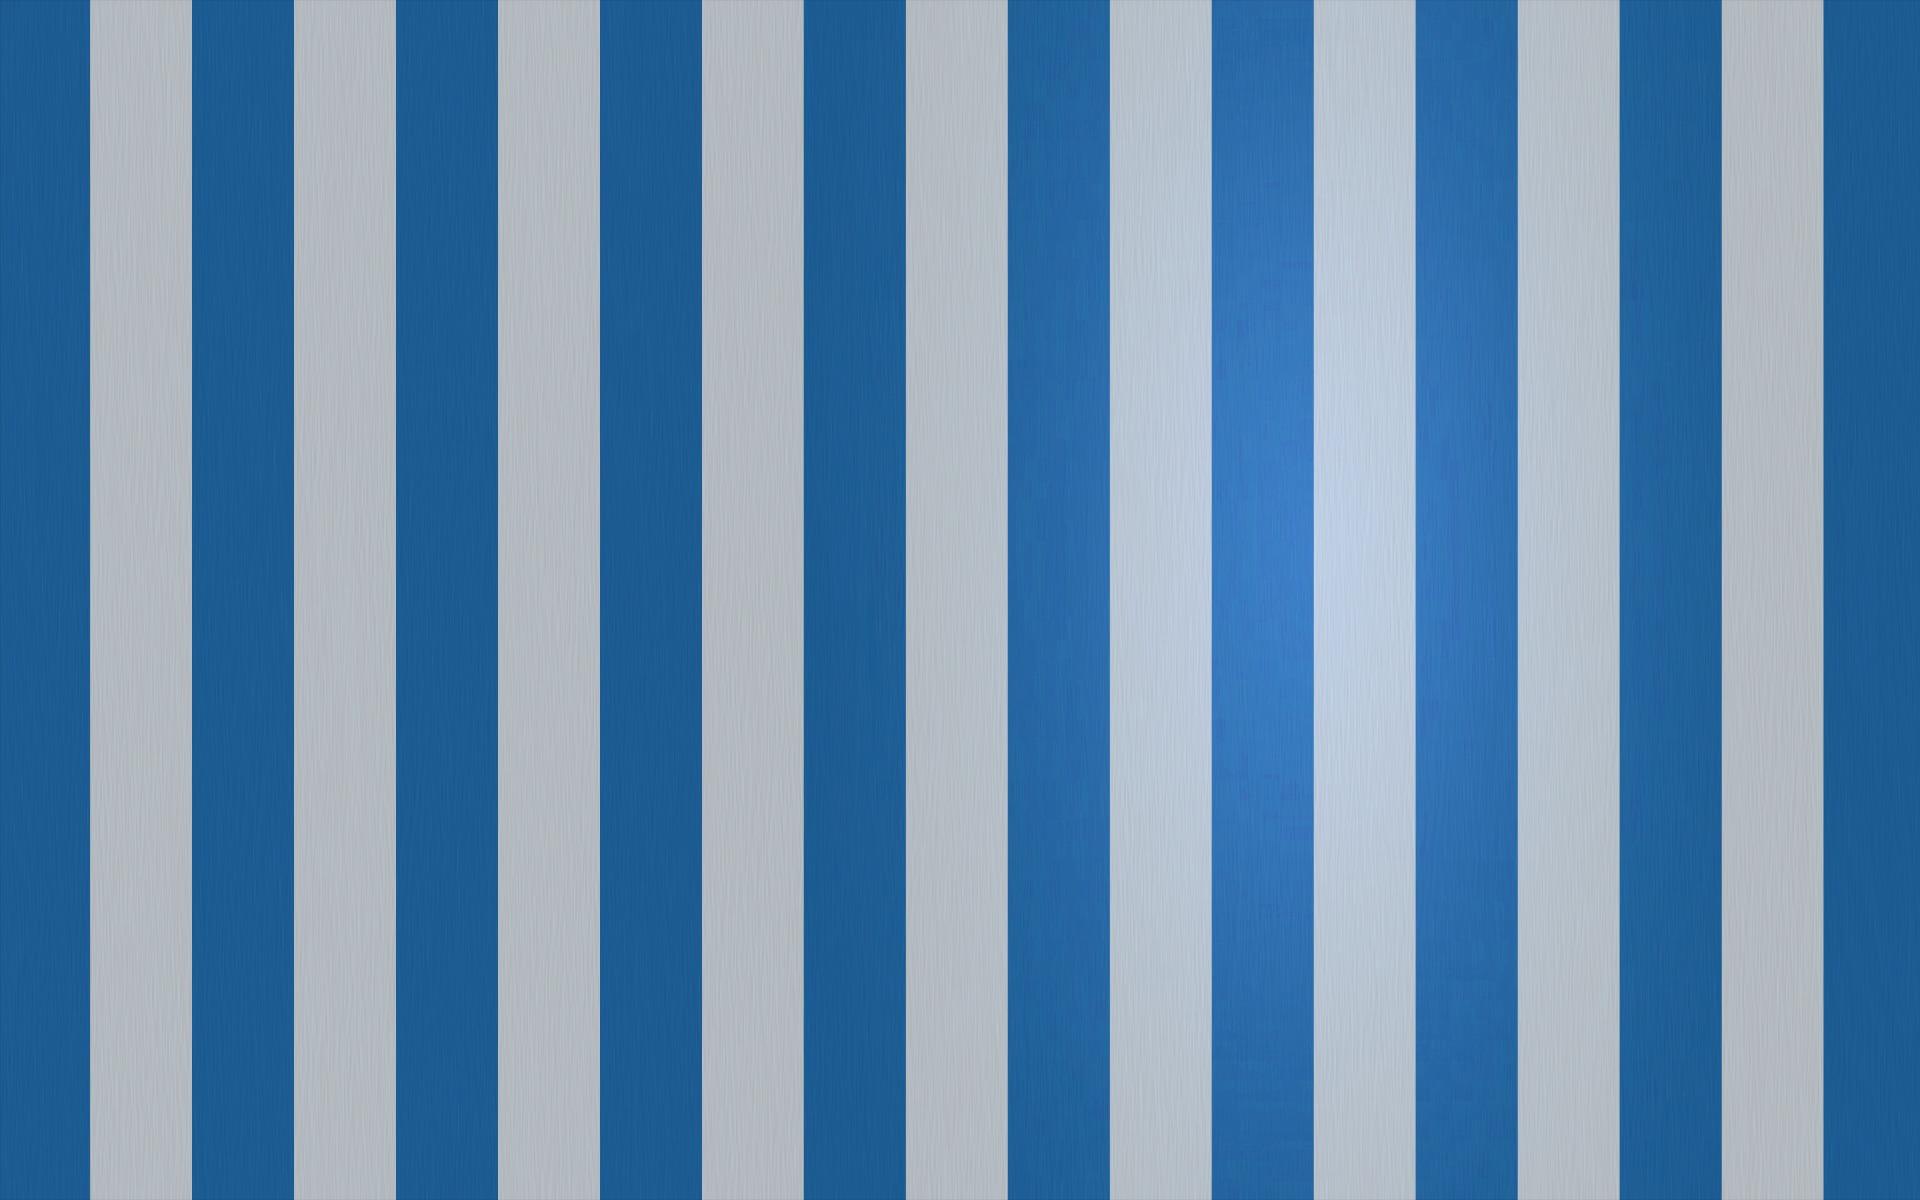 Stripe Blue Green And White: Blue Stripe Wallpaper